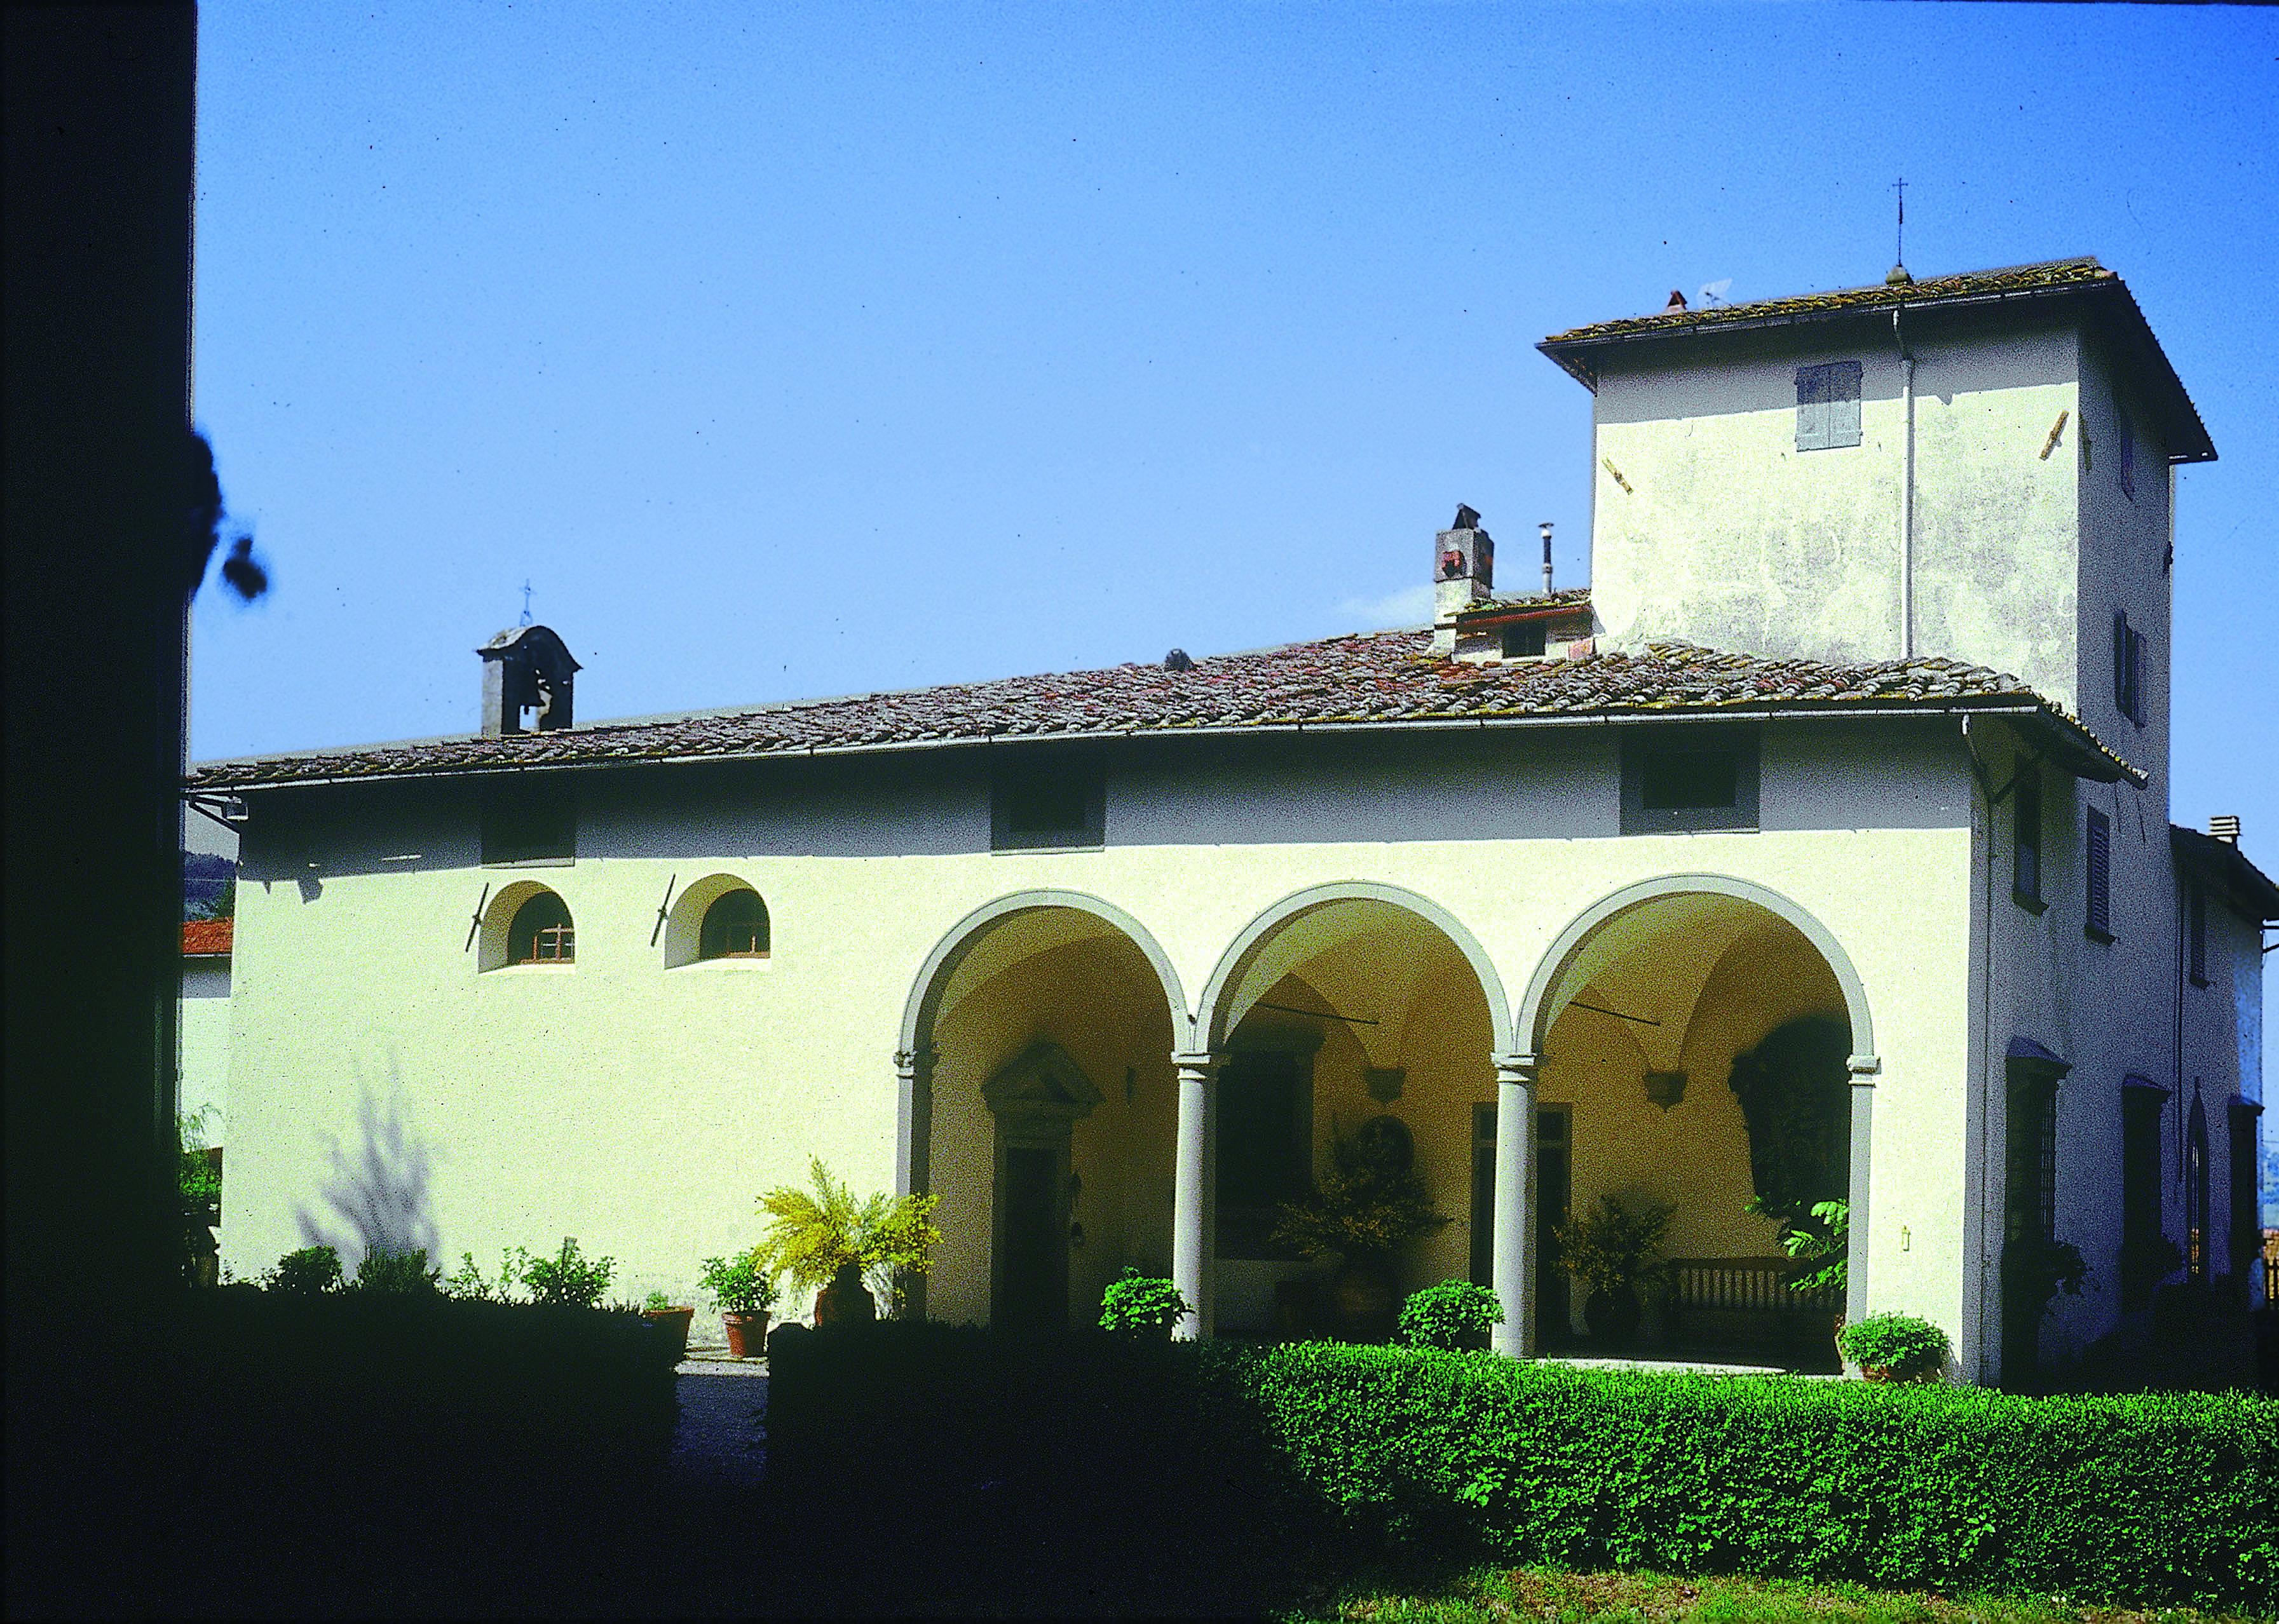 marchesi-frescobaldi-villa